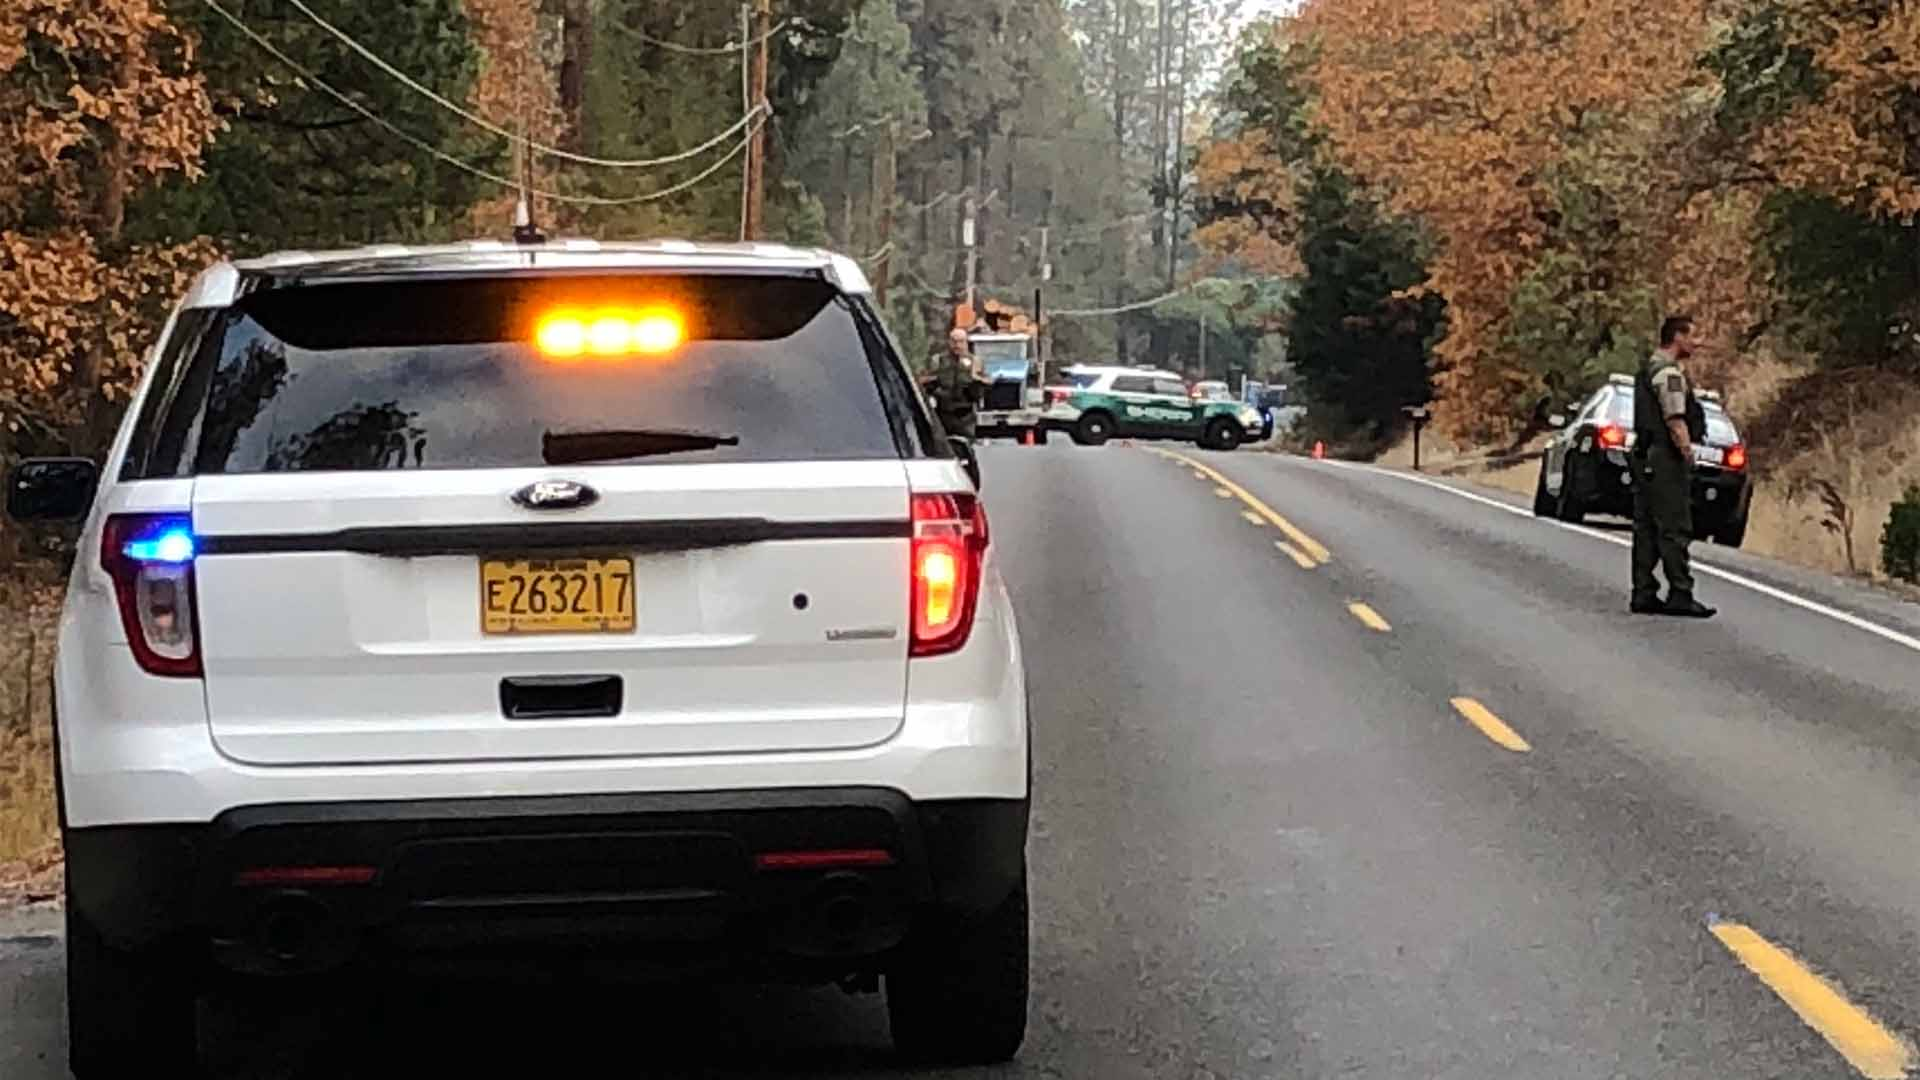 13-year-old involved in roadside fatality - KOBI-TV NBC5 / KOTI-TV NBC2